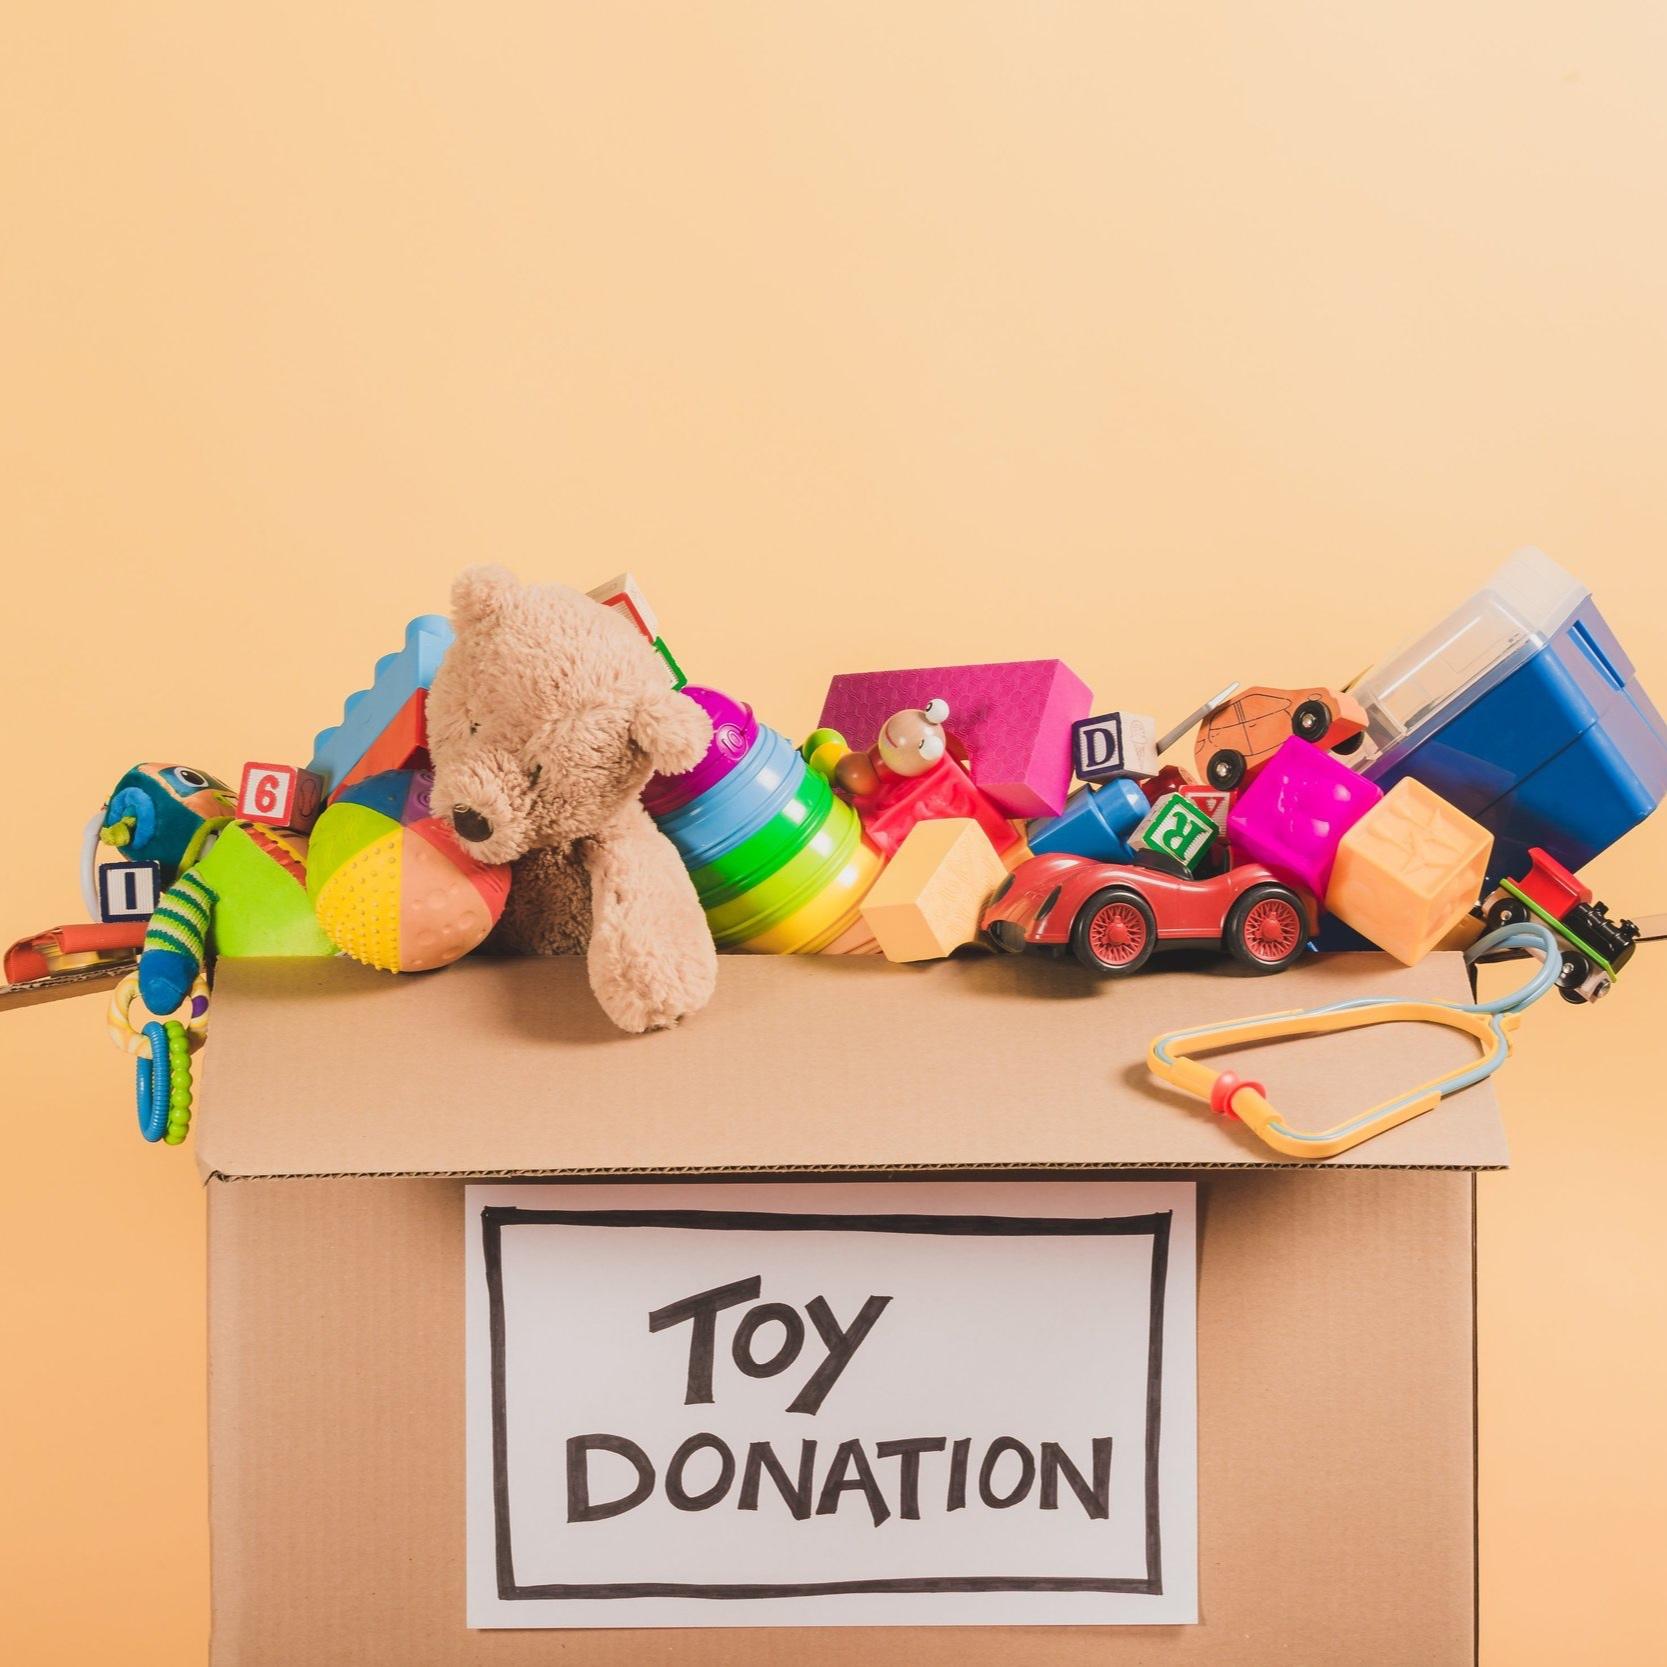 toy-drive-donation-box_4460x4460.jpg